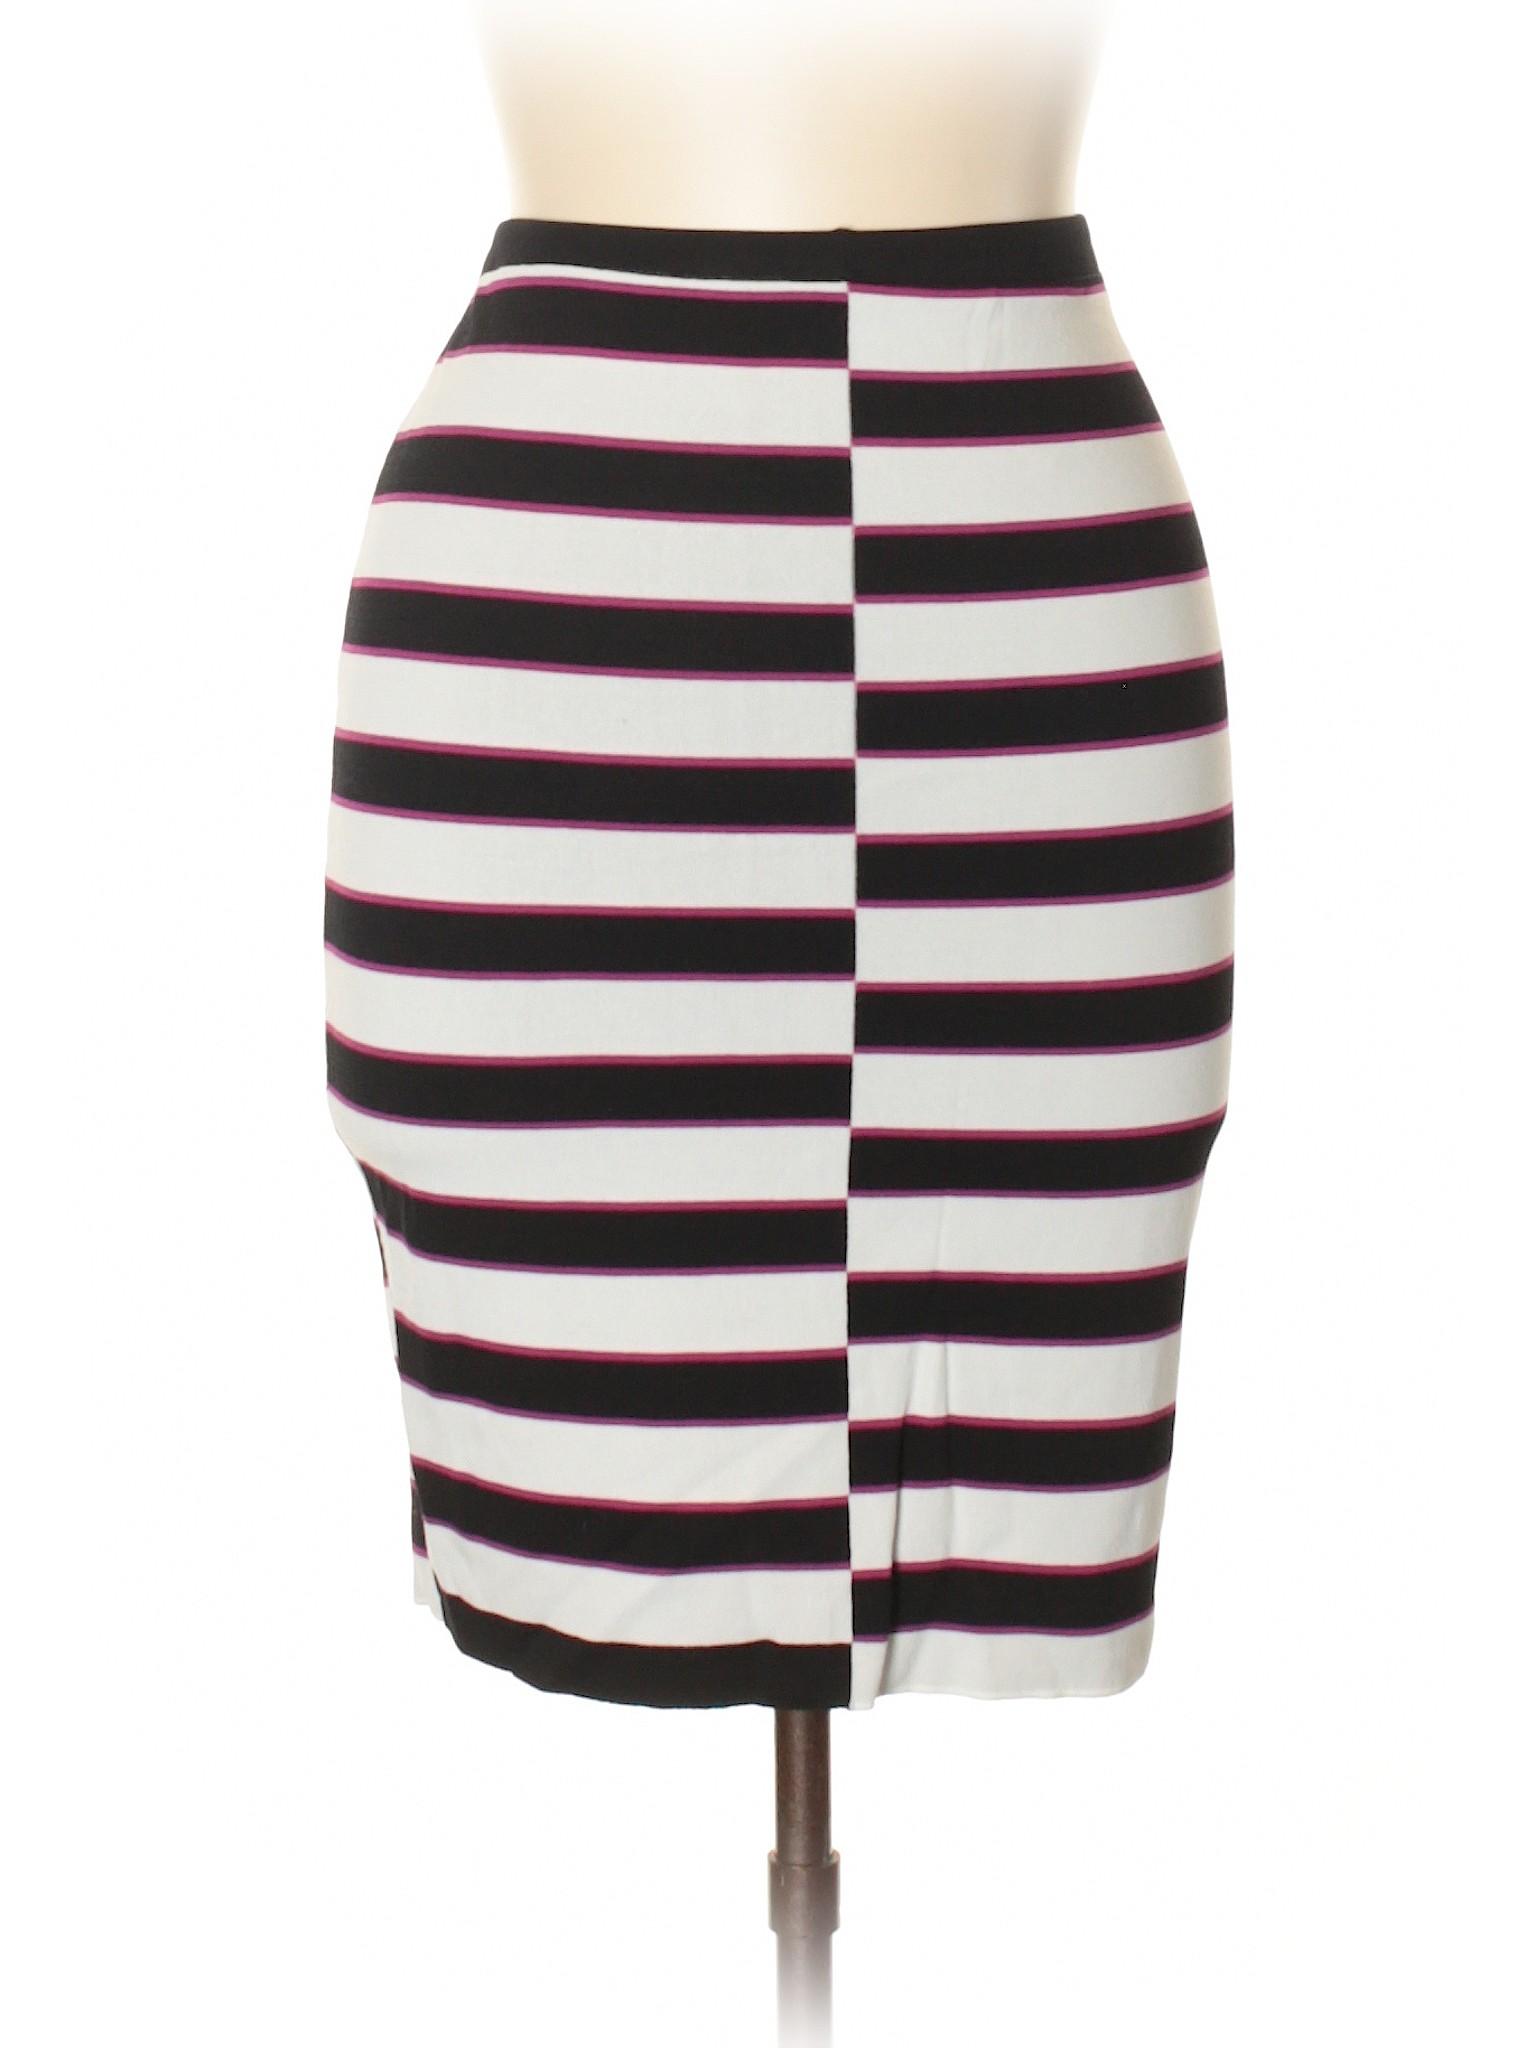 Skirt Skirt Boutique 41Hawthorn Skirt leisure 41Hawthorn 41Hawthorn Casual leisure Boutique Casual Boutique Casual leisure HqWTBOOXa